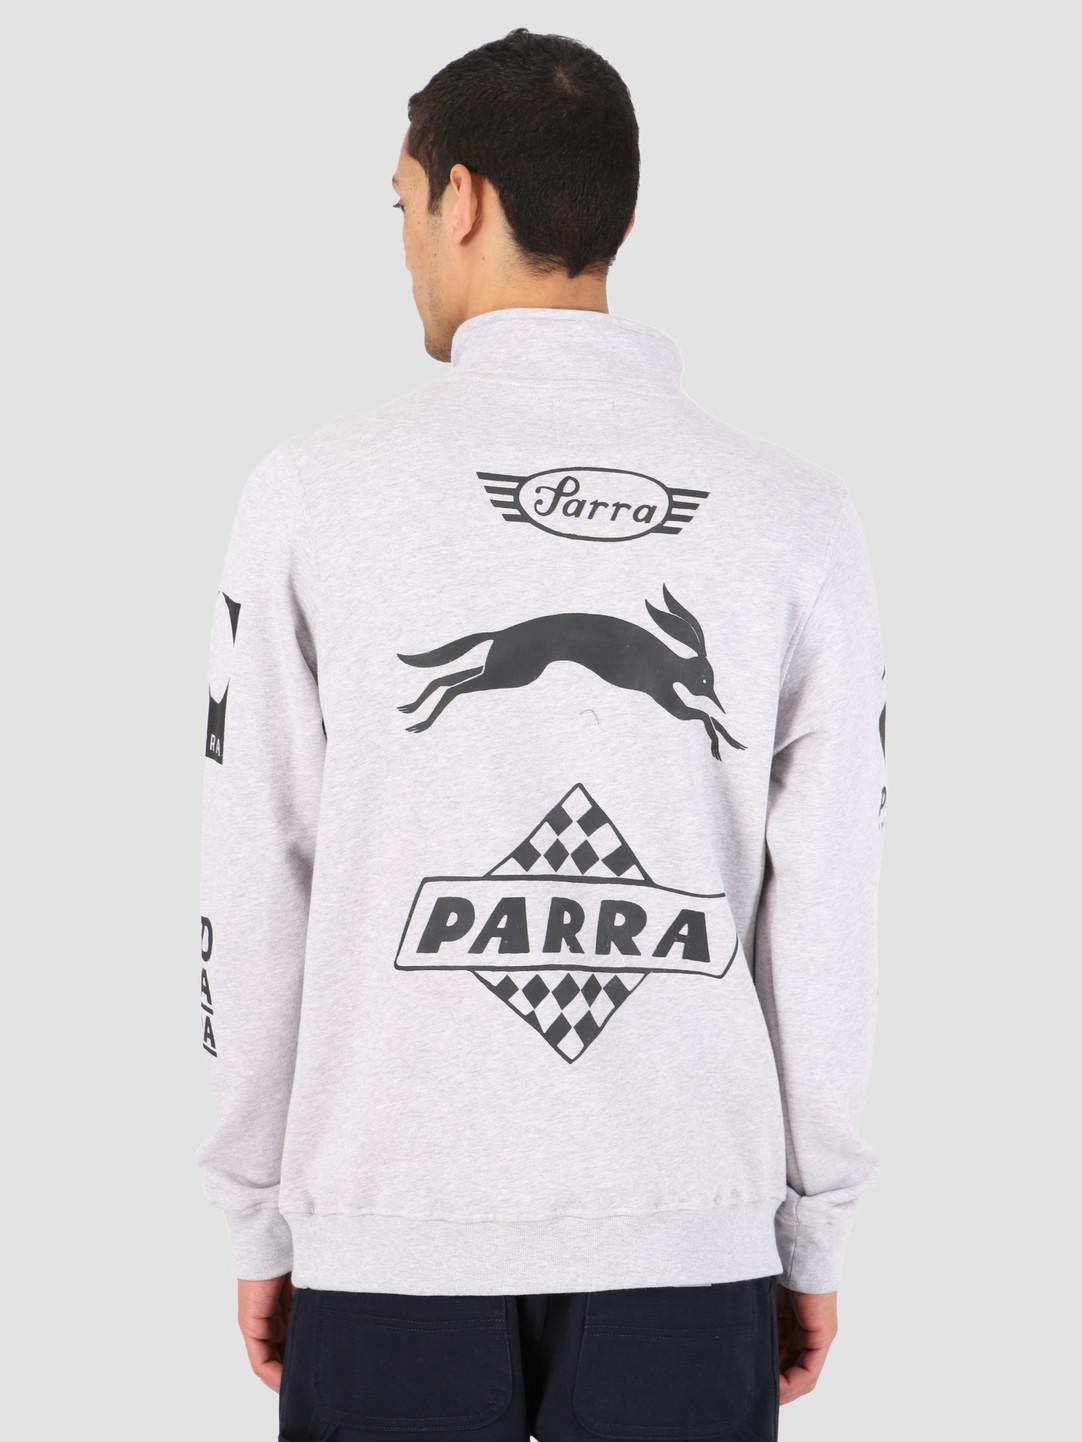 By Parra By Parra Quarter Zip Sweater Sponsored Ash Gray 42410